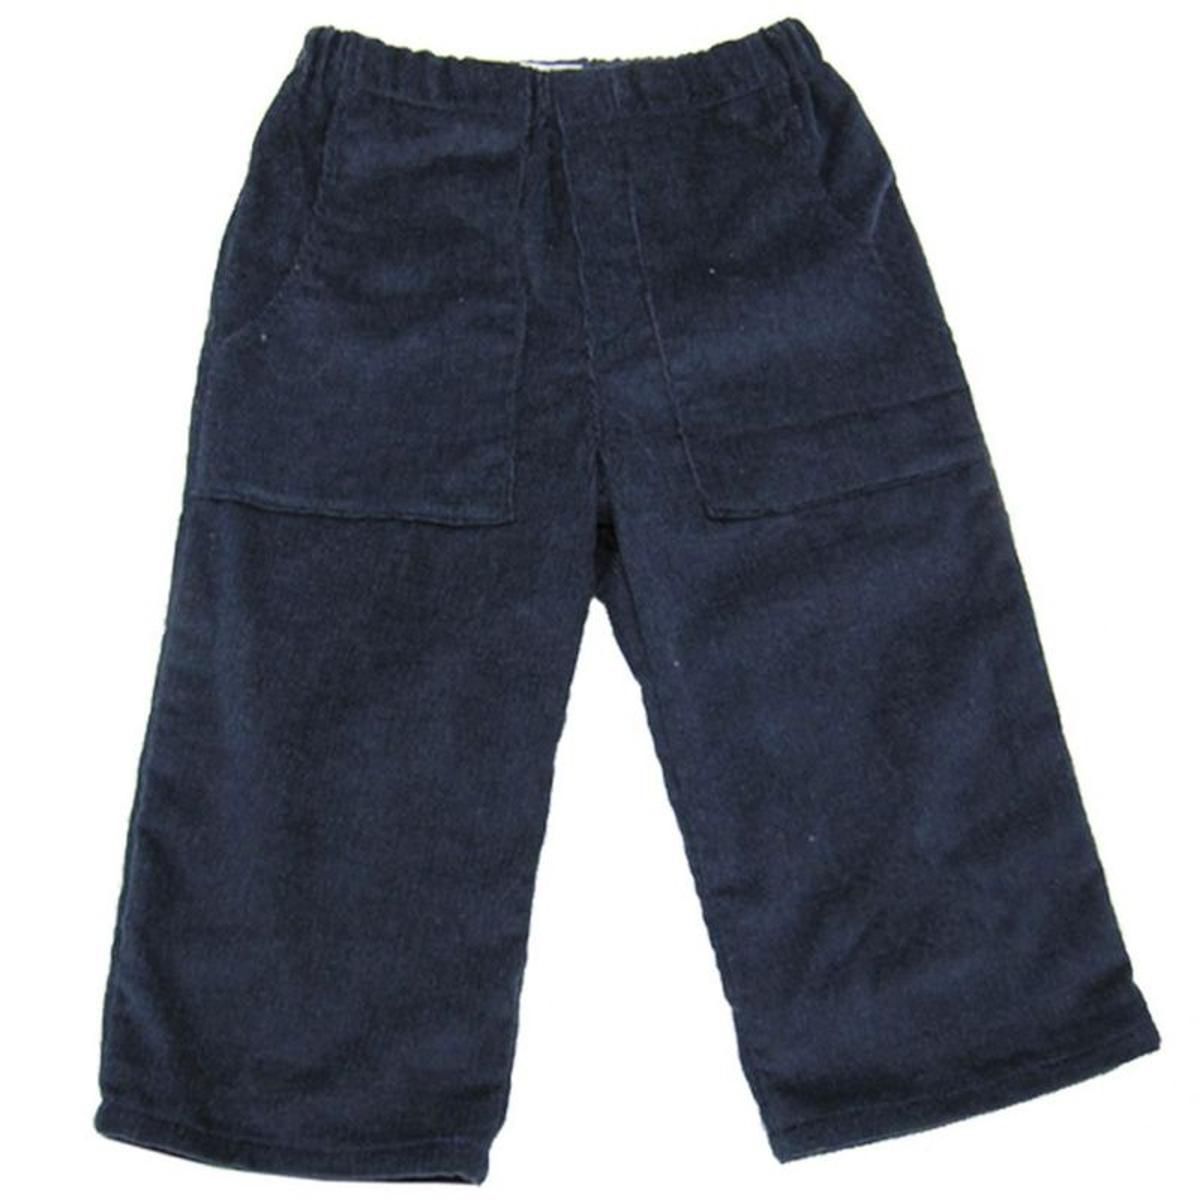 Pantalon uni 6 mois-4 ans Made in France